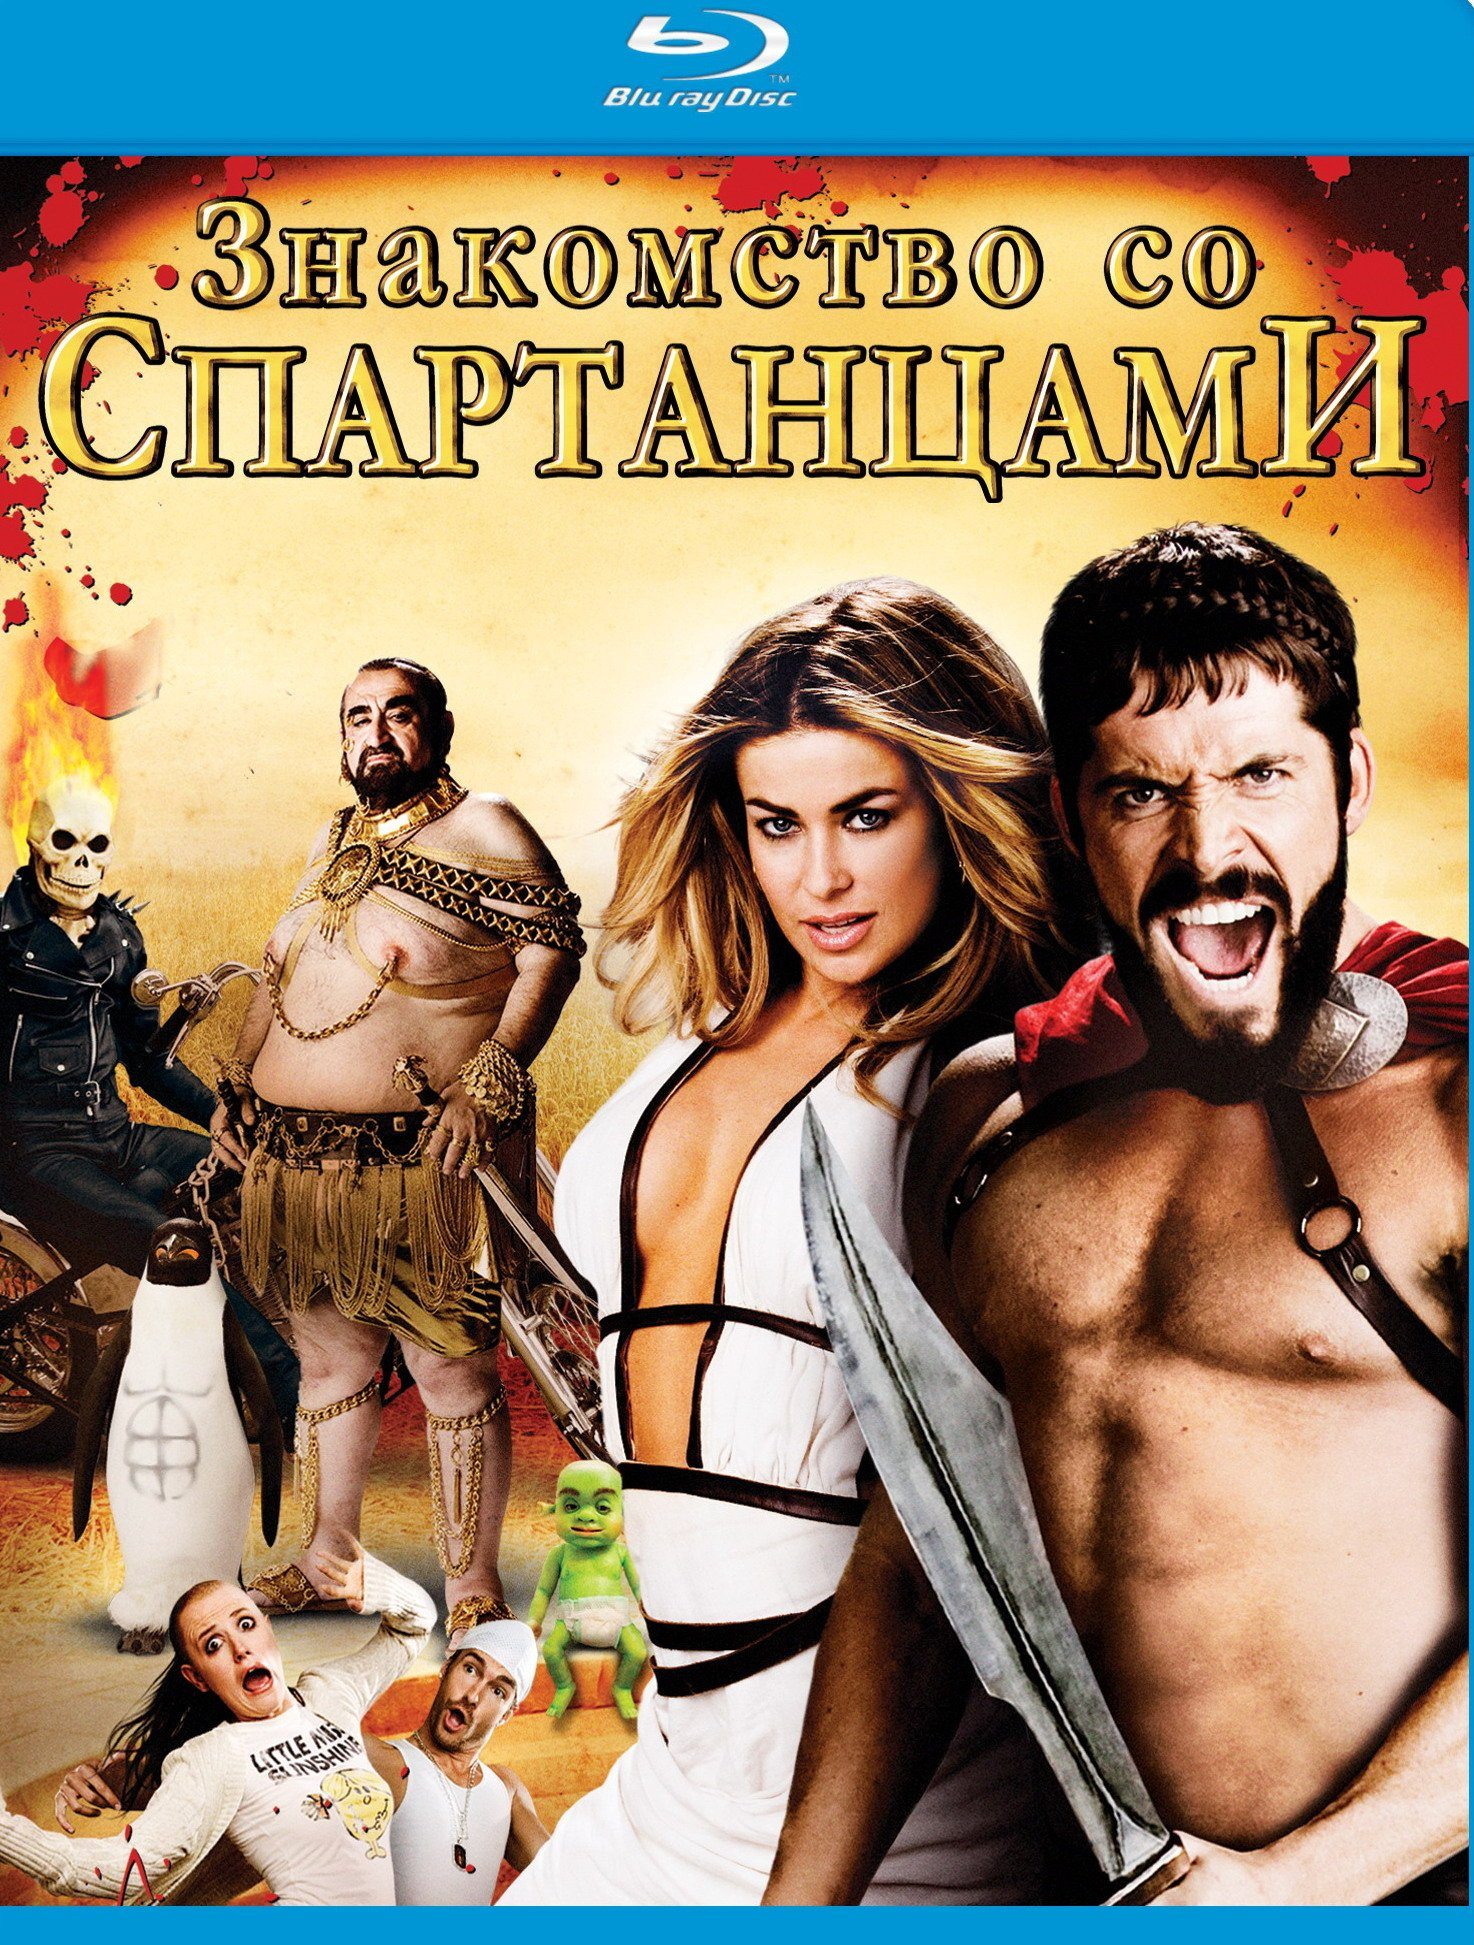 meet spartans full movie online